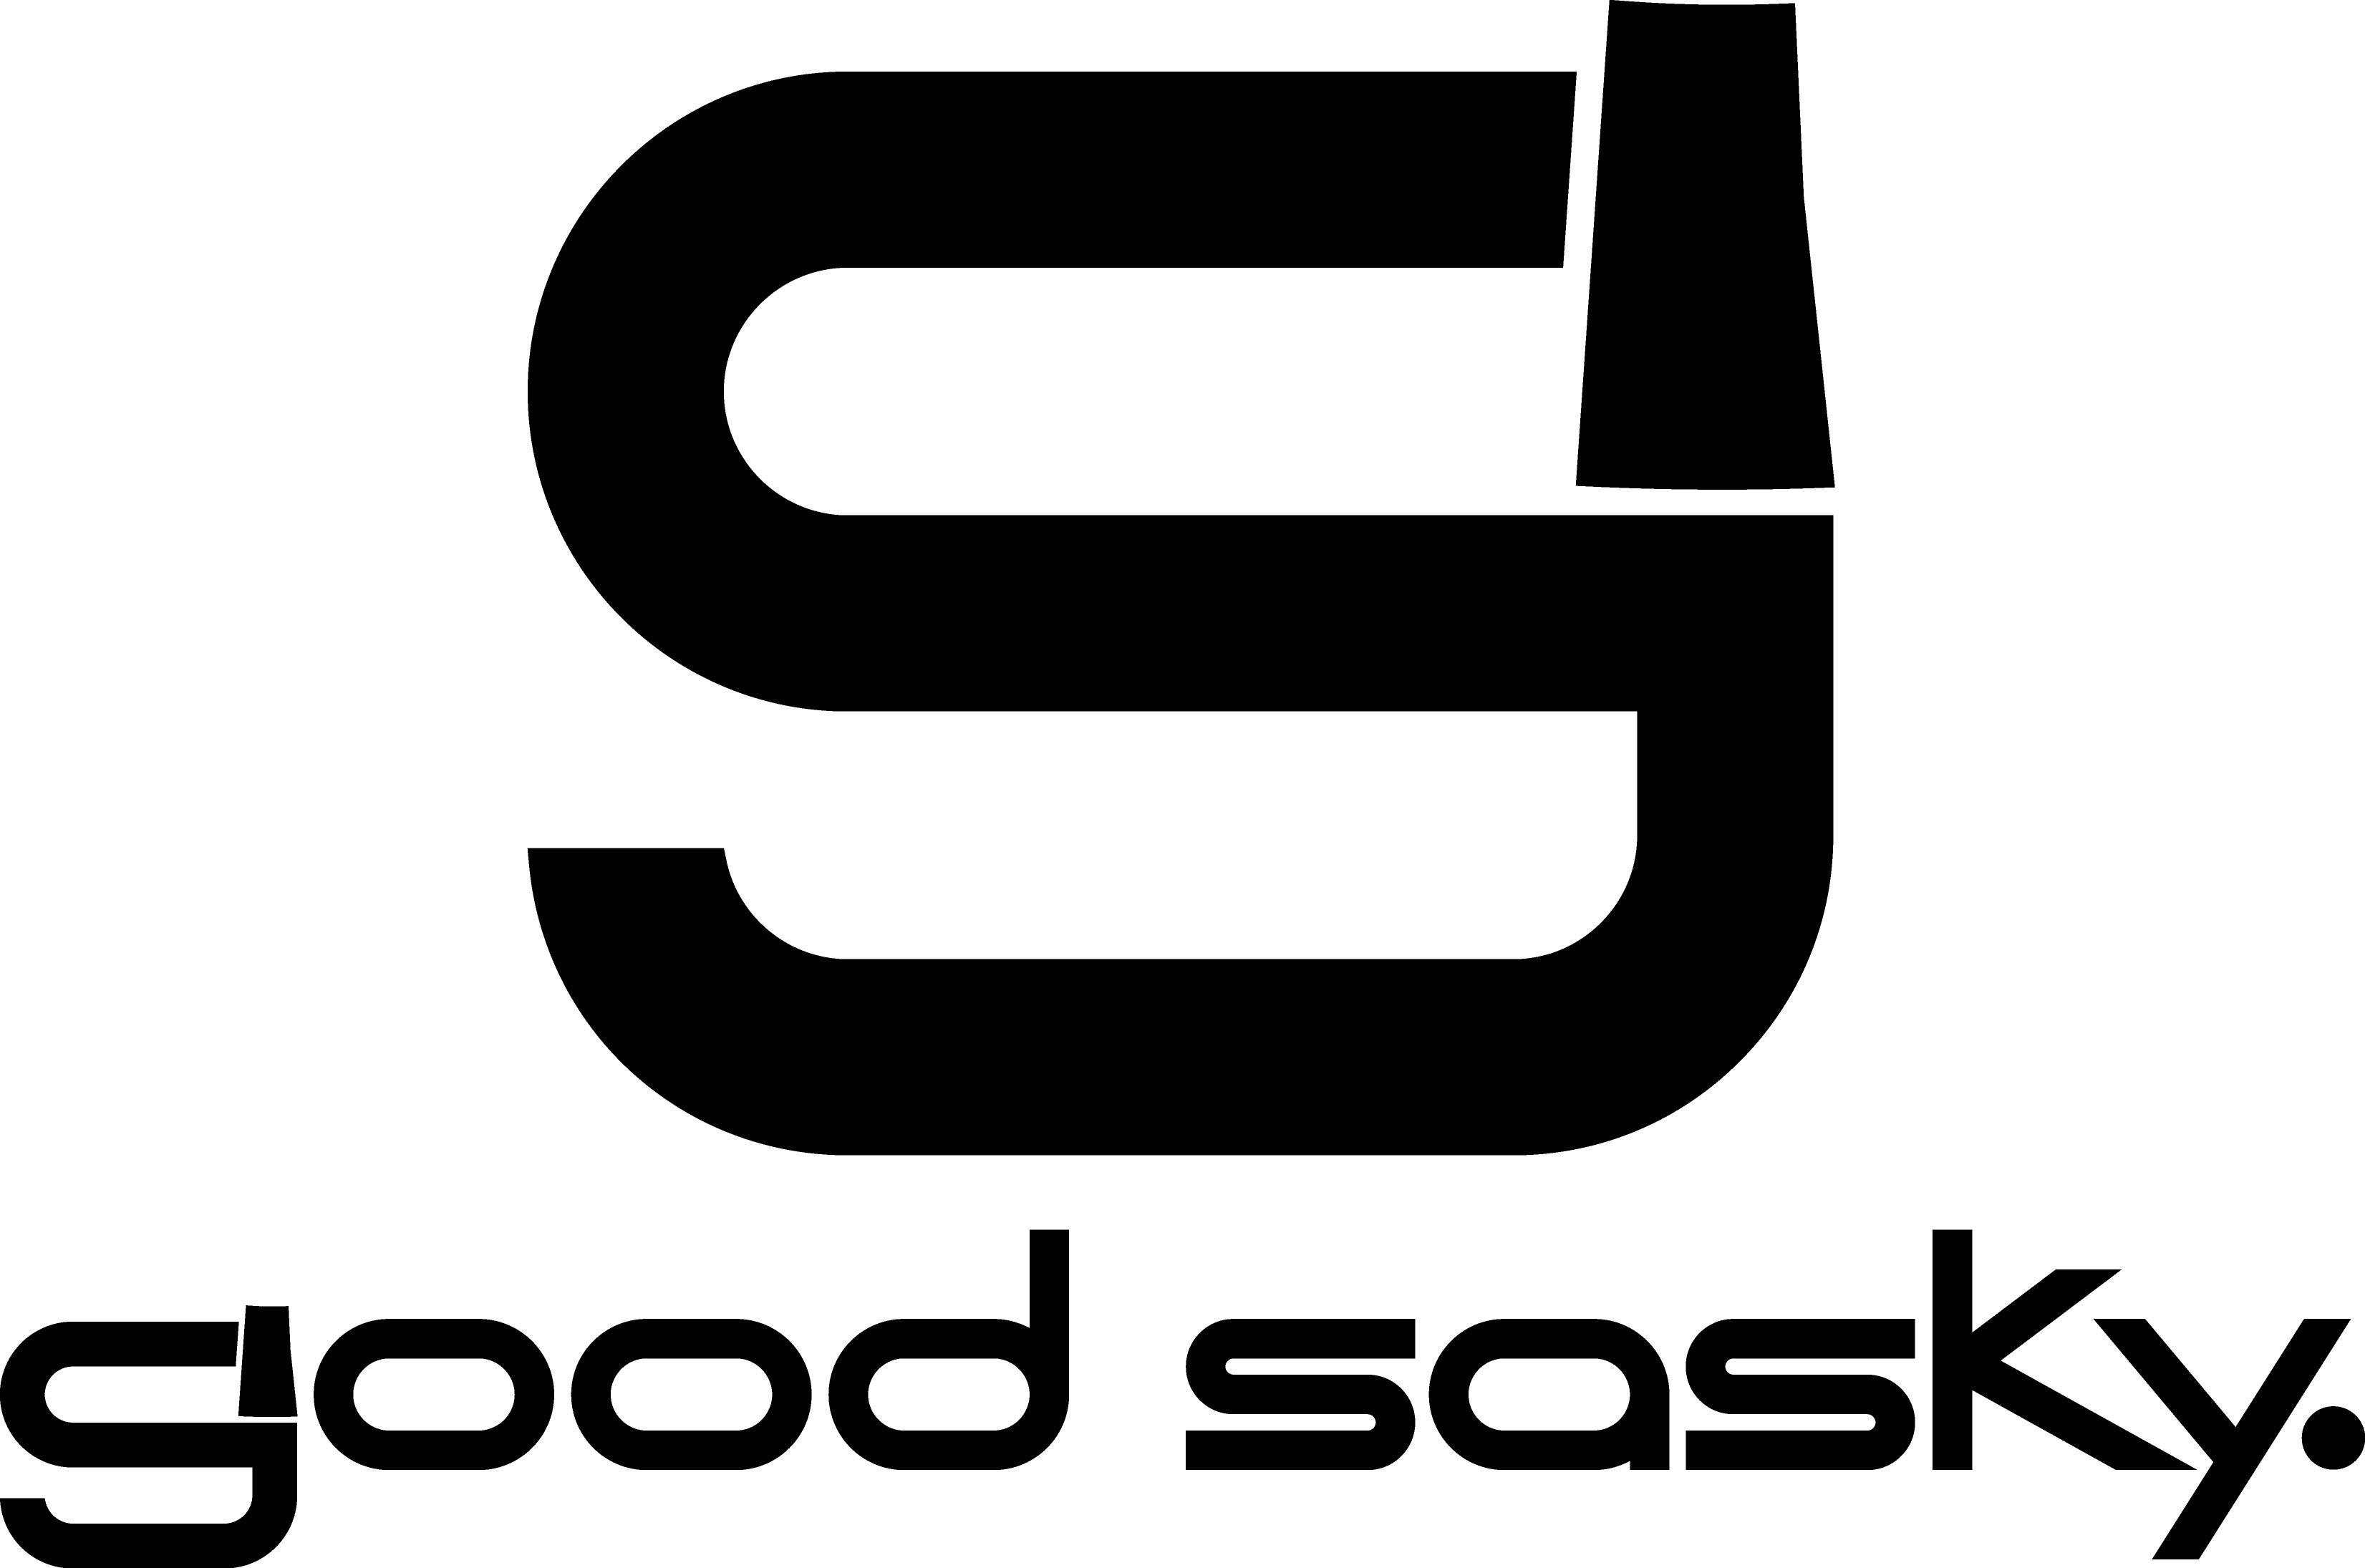 Good Sasky